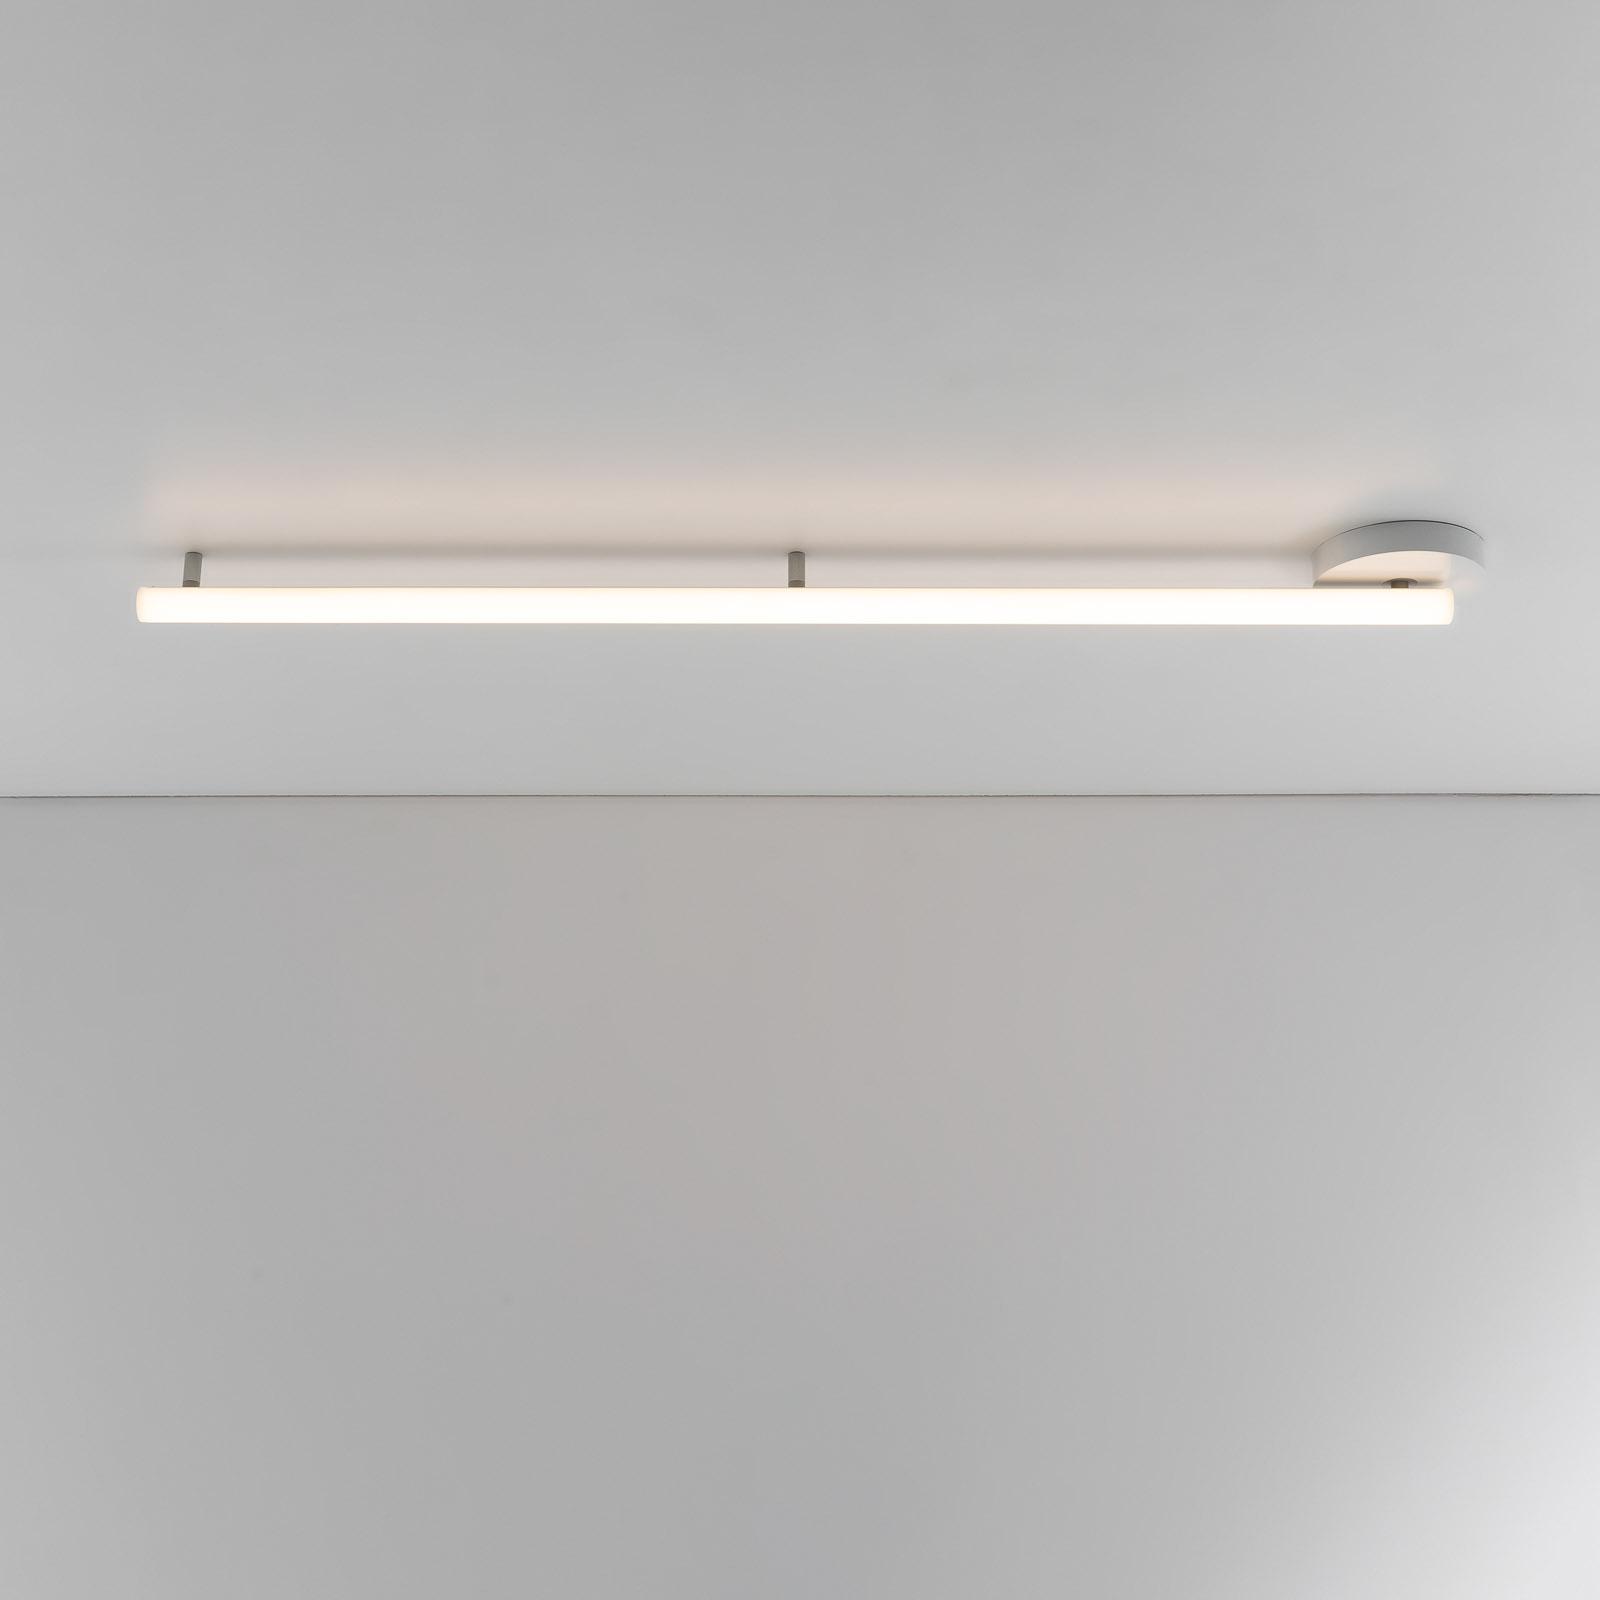 Artemide Alphabet of light linear, Decke, 120 cm